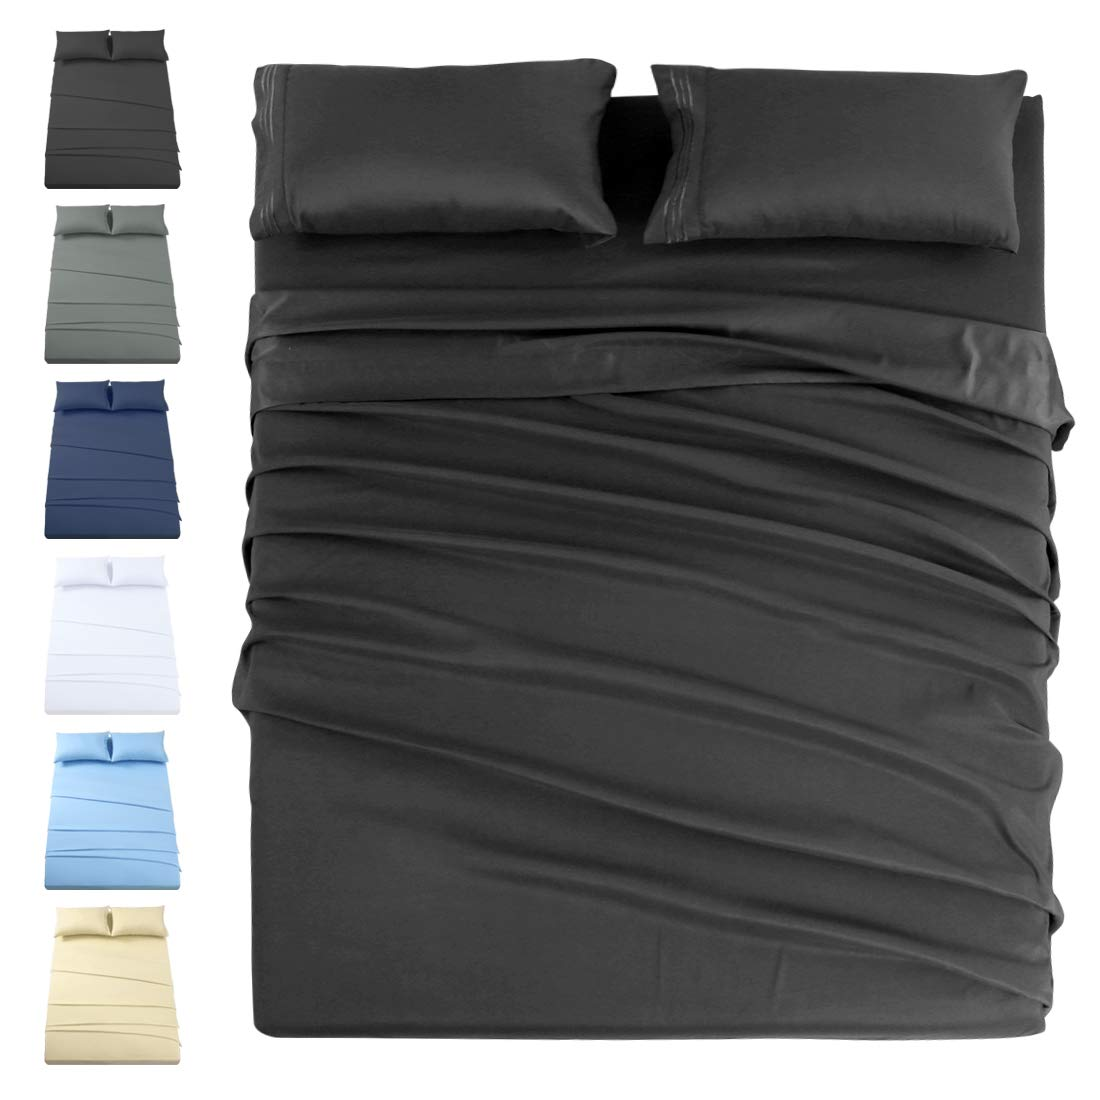 INGALIK Premium Bed Sheet Set 3 Piece 120 GSM Brushed Microfiber,1800 Series Hotel Luxury Bedding Sheets,Ultra Soft,Comfy,Fade Resistant,No Shrinkage,Hypoallergenic,Deep Pocket(Dark Grey,Twin)